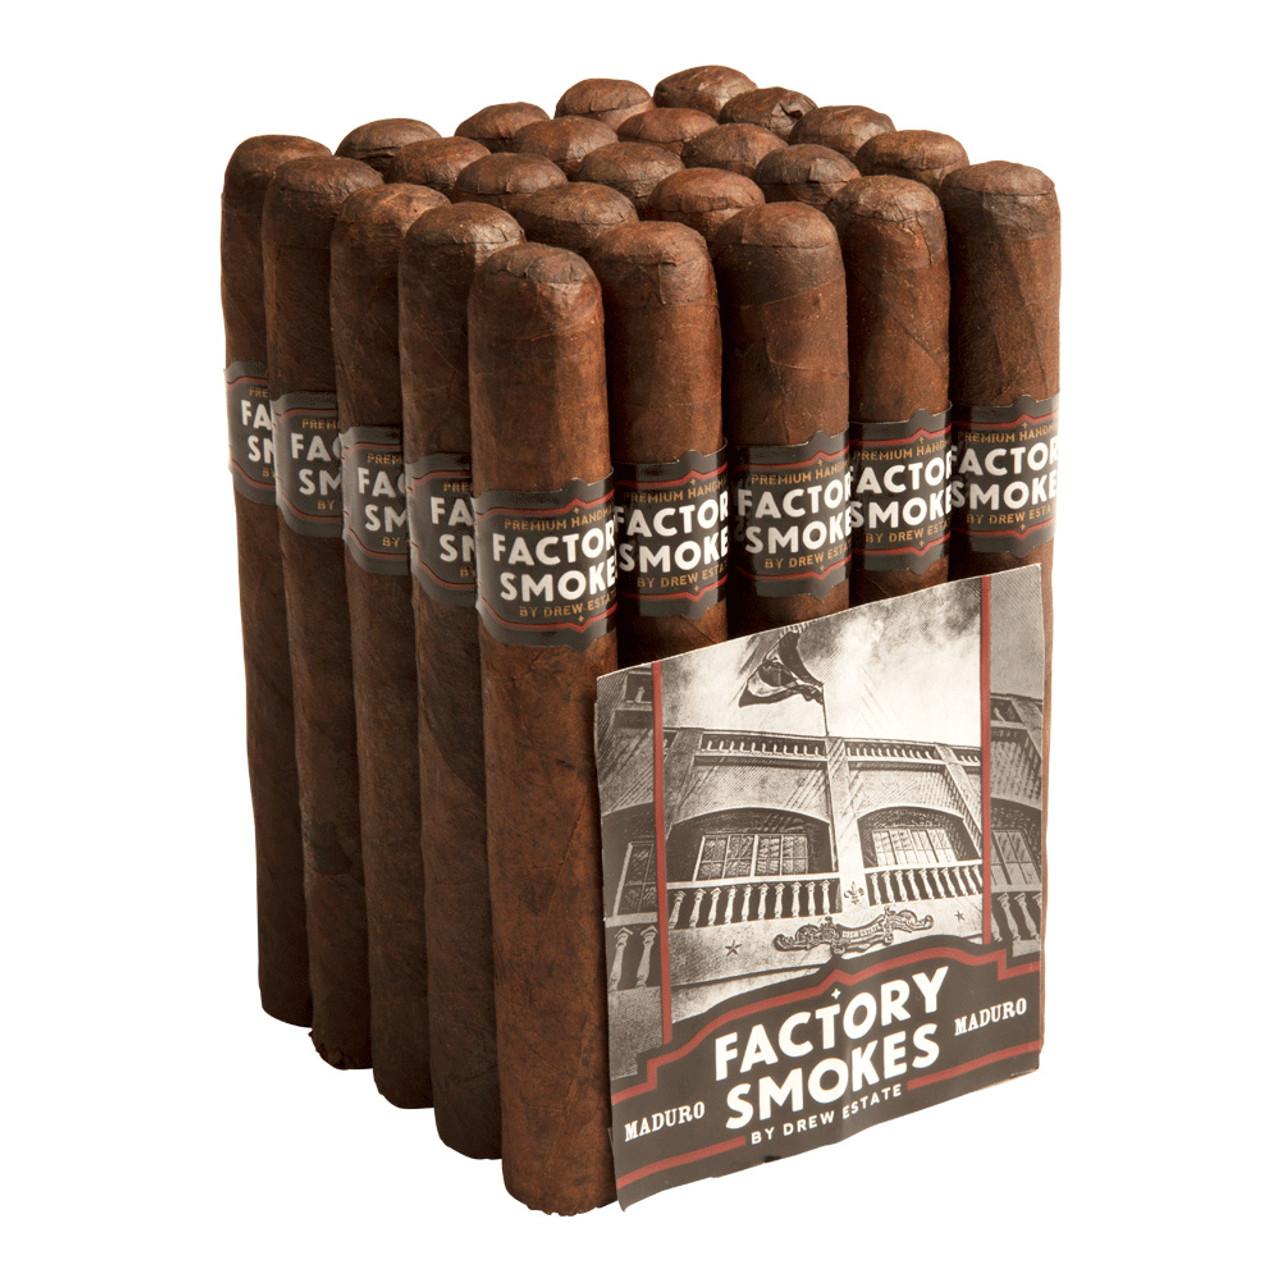 Factory Smokes by Drew Estate Toro Maduro Cigars - 6 x 52 (Bundle of 20)